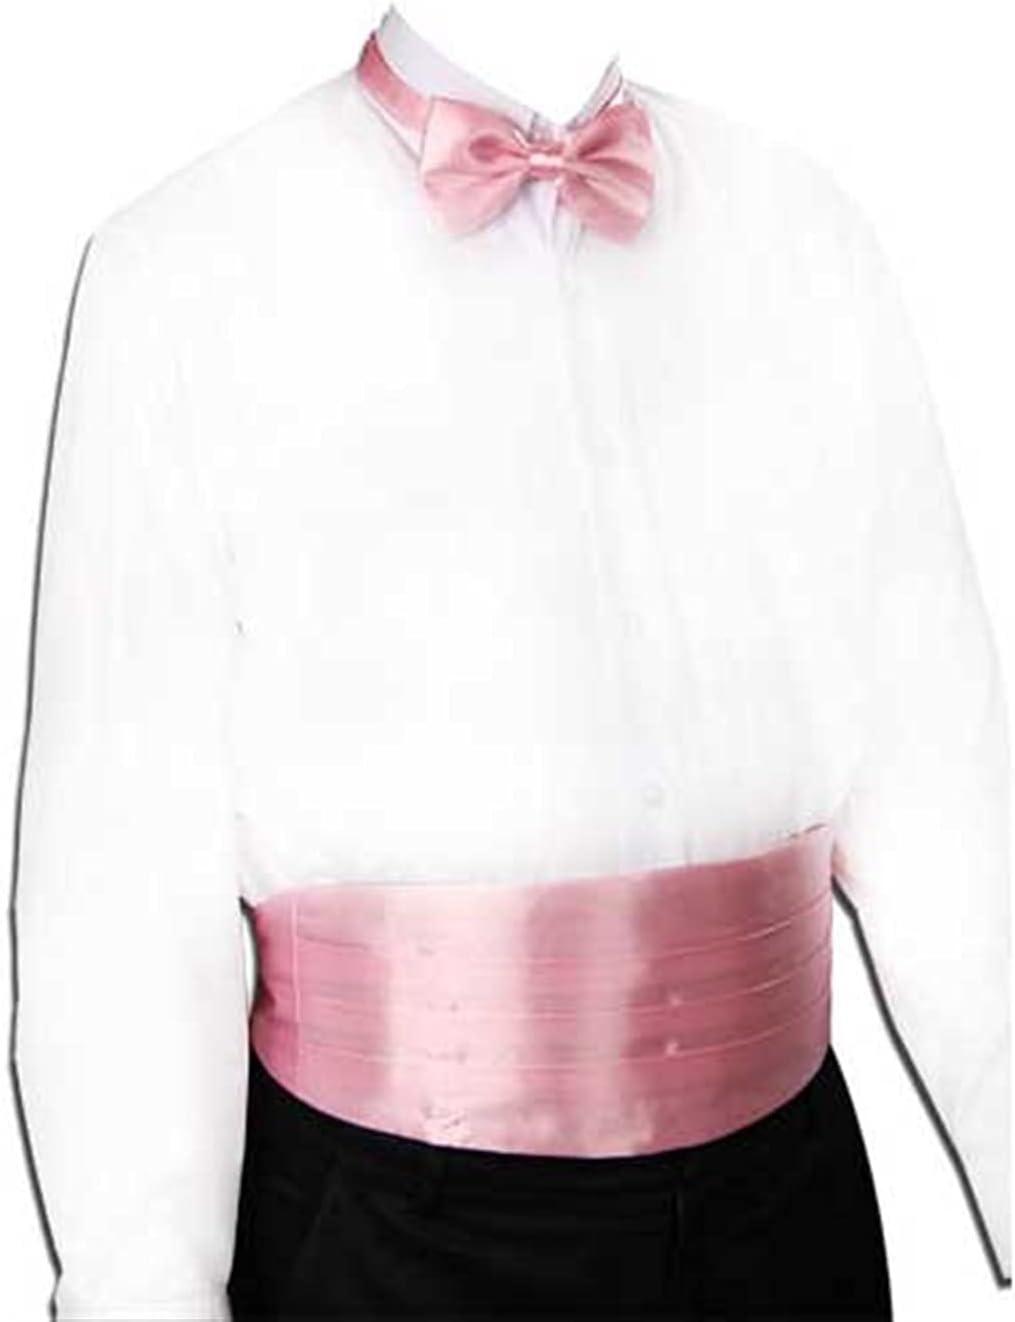 JJZXC Gentleman Solid Wide Silk Satin Elastic Belly Band Tuxedo Cummerbund Commercial Banquet Model Business Elite (Color : E)